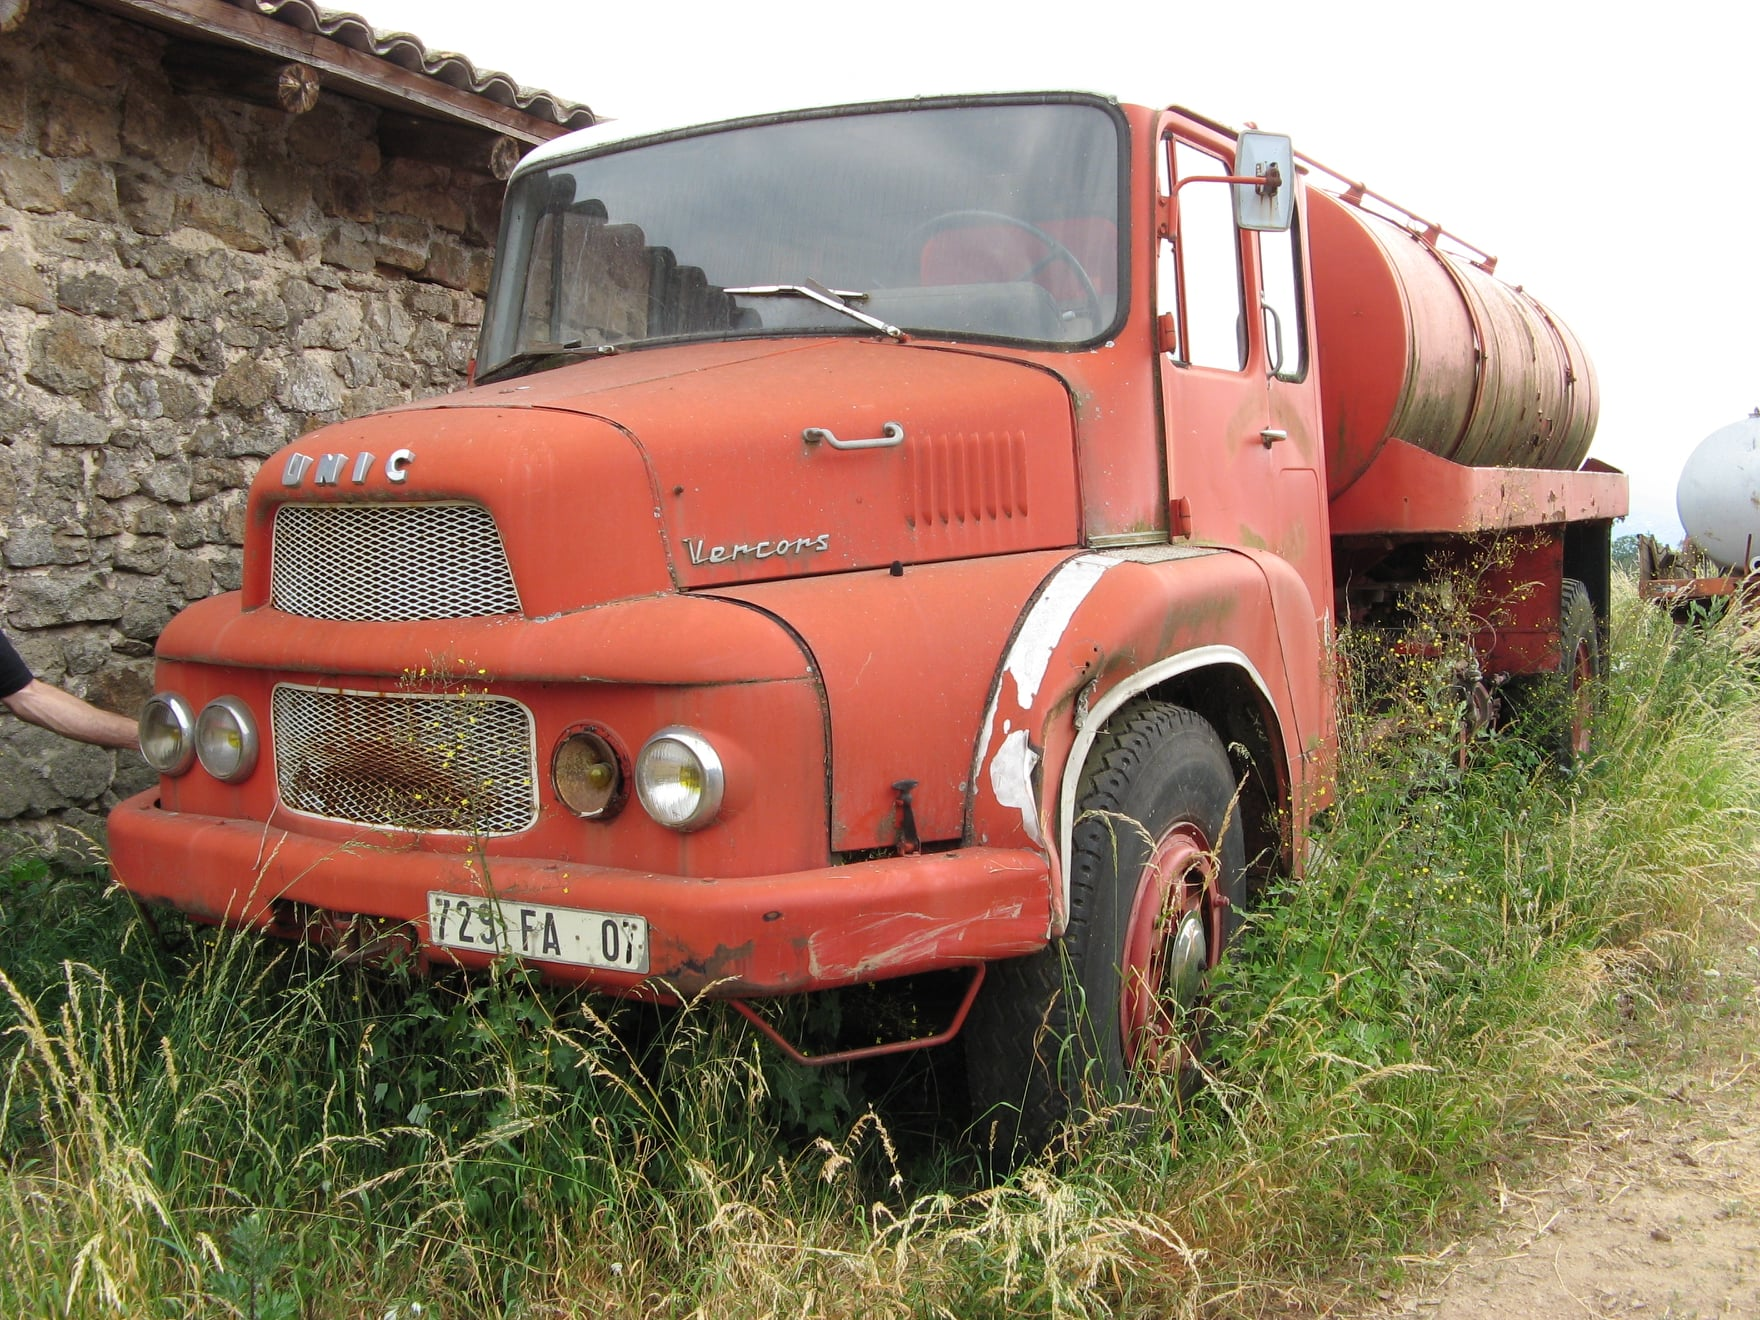 Unic-MZ7-cabine-Kouchette--1966